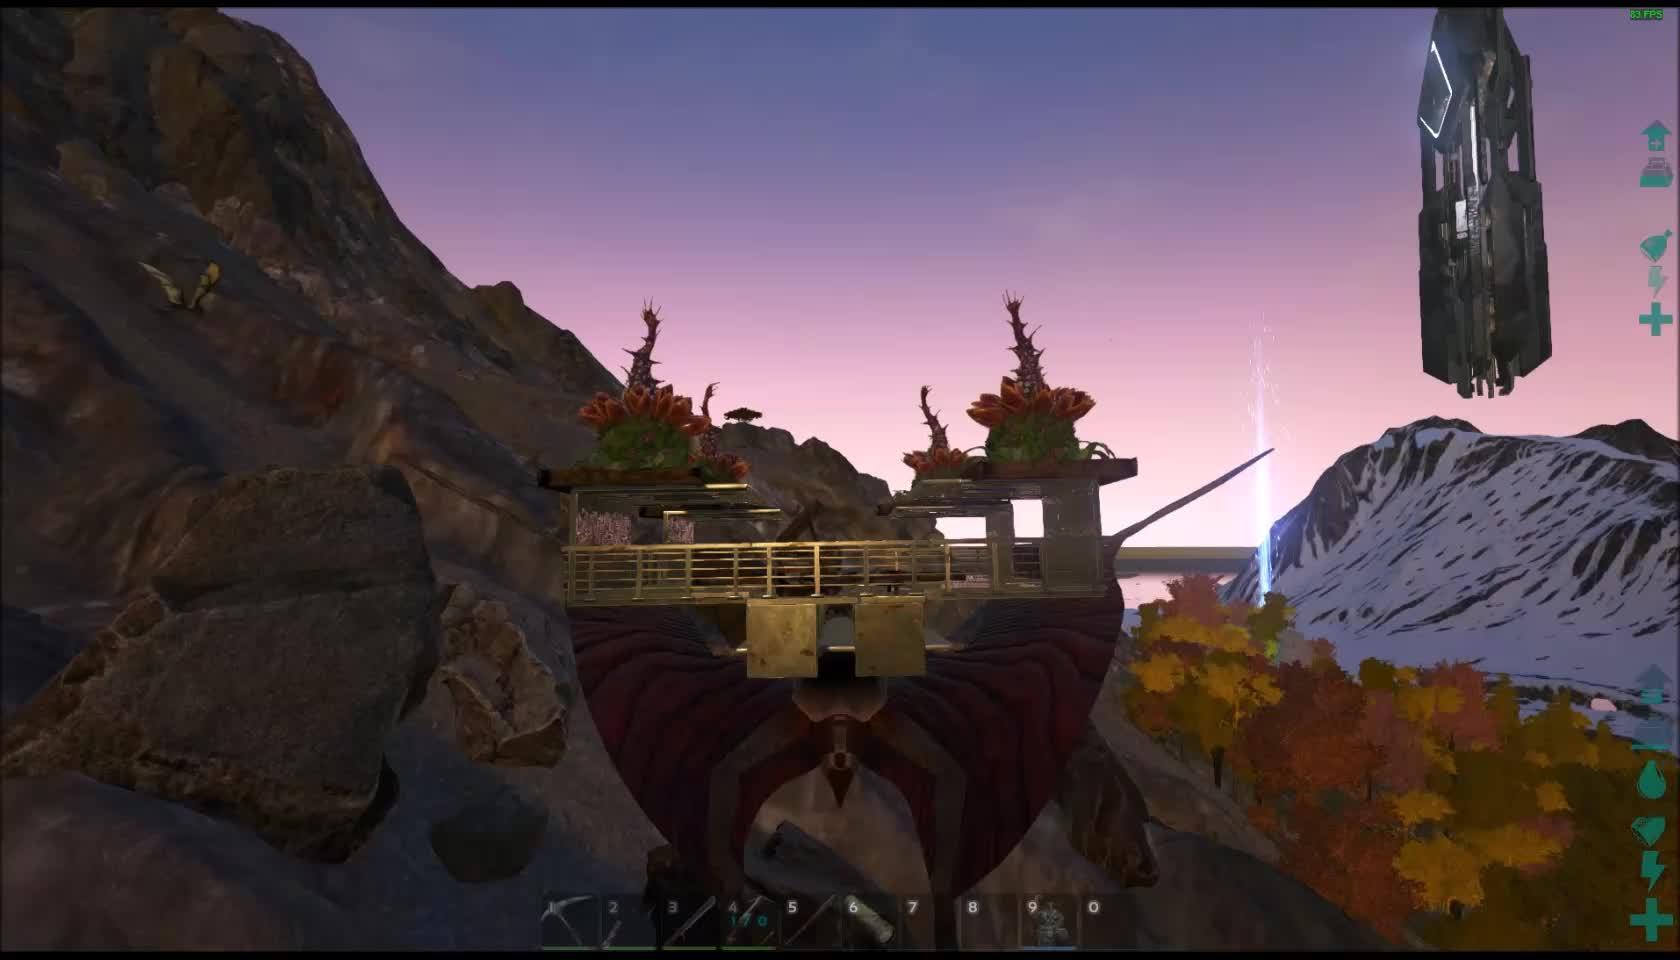 Ark, playark, Xplants now work on Quetzals! GIFs